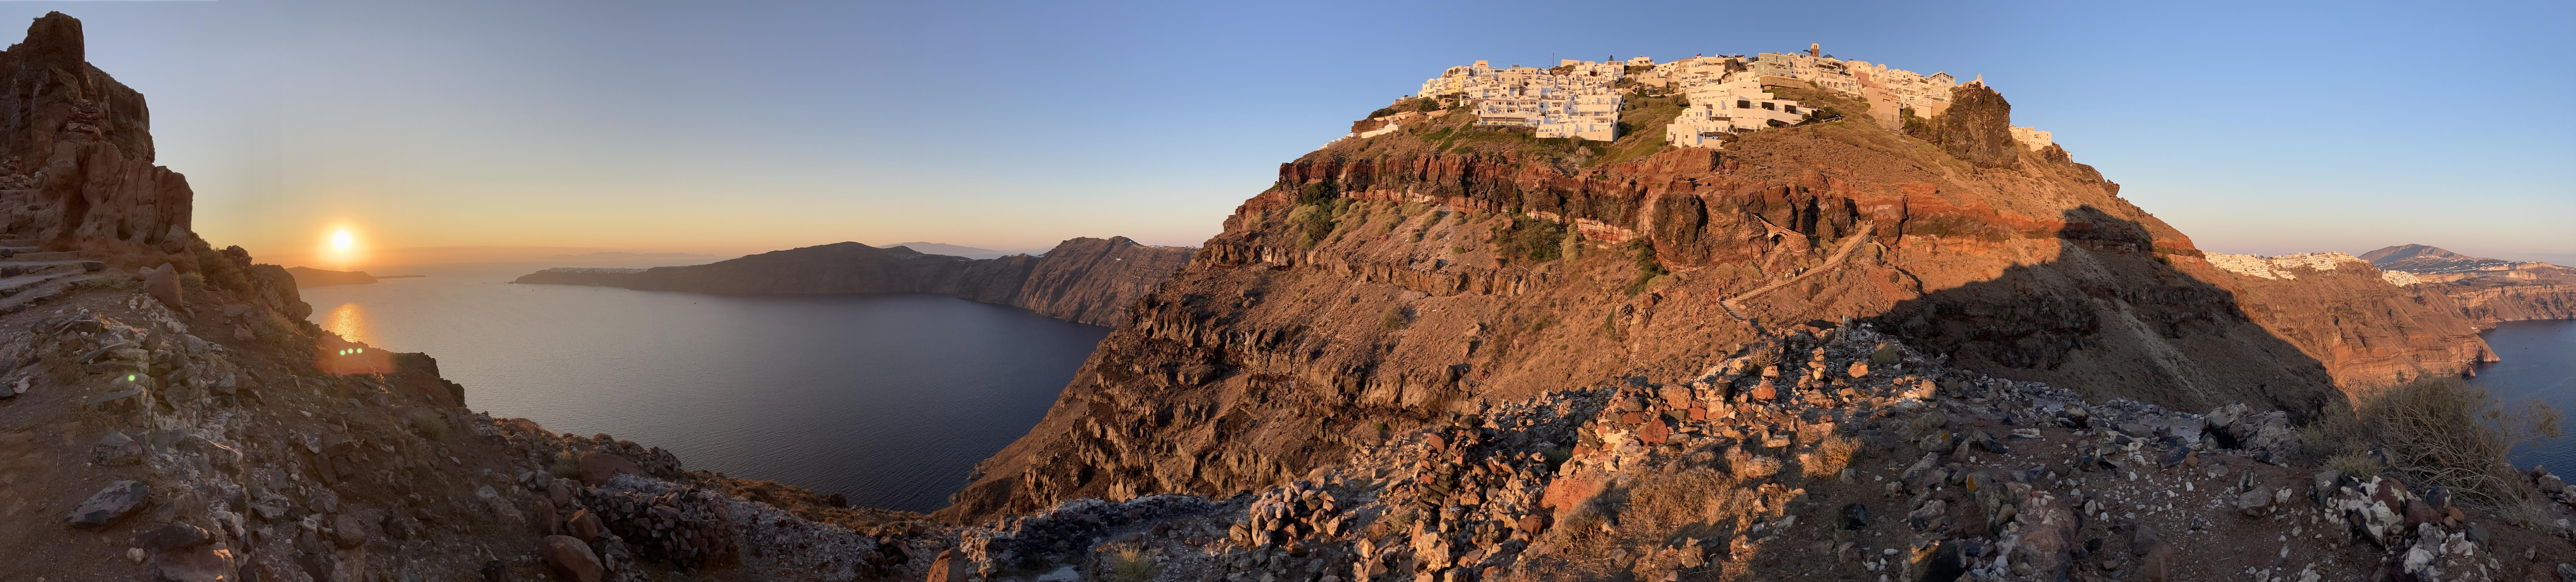 panorámica del atardecer en Santorini